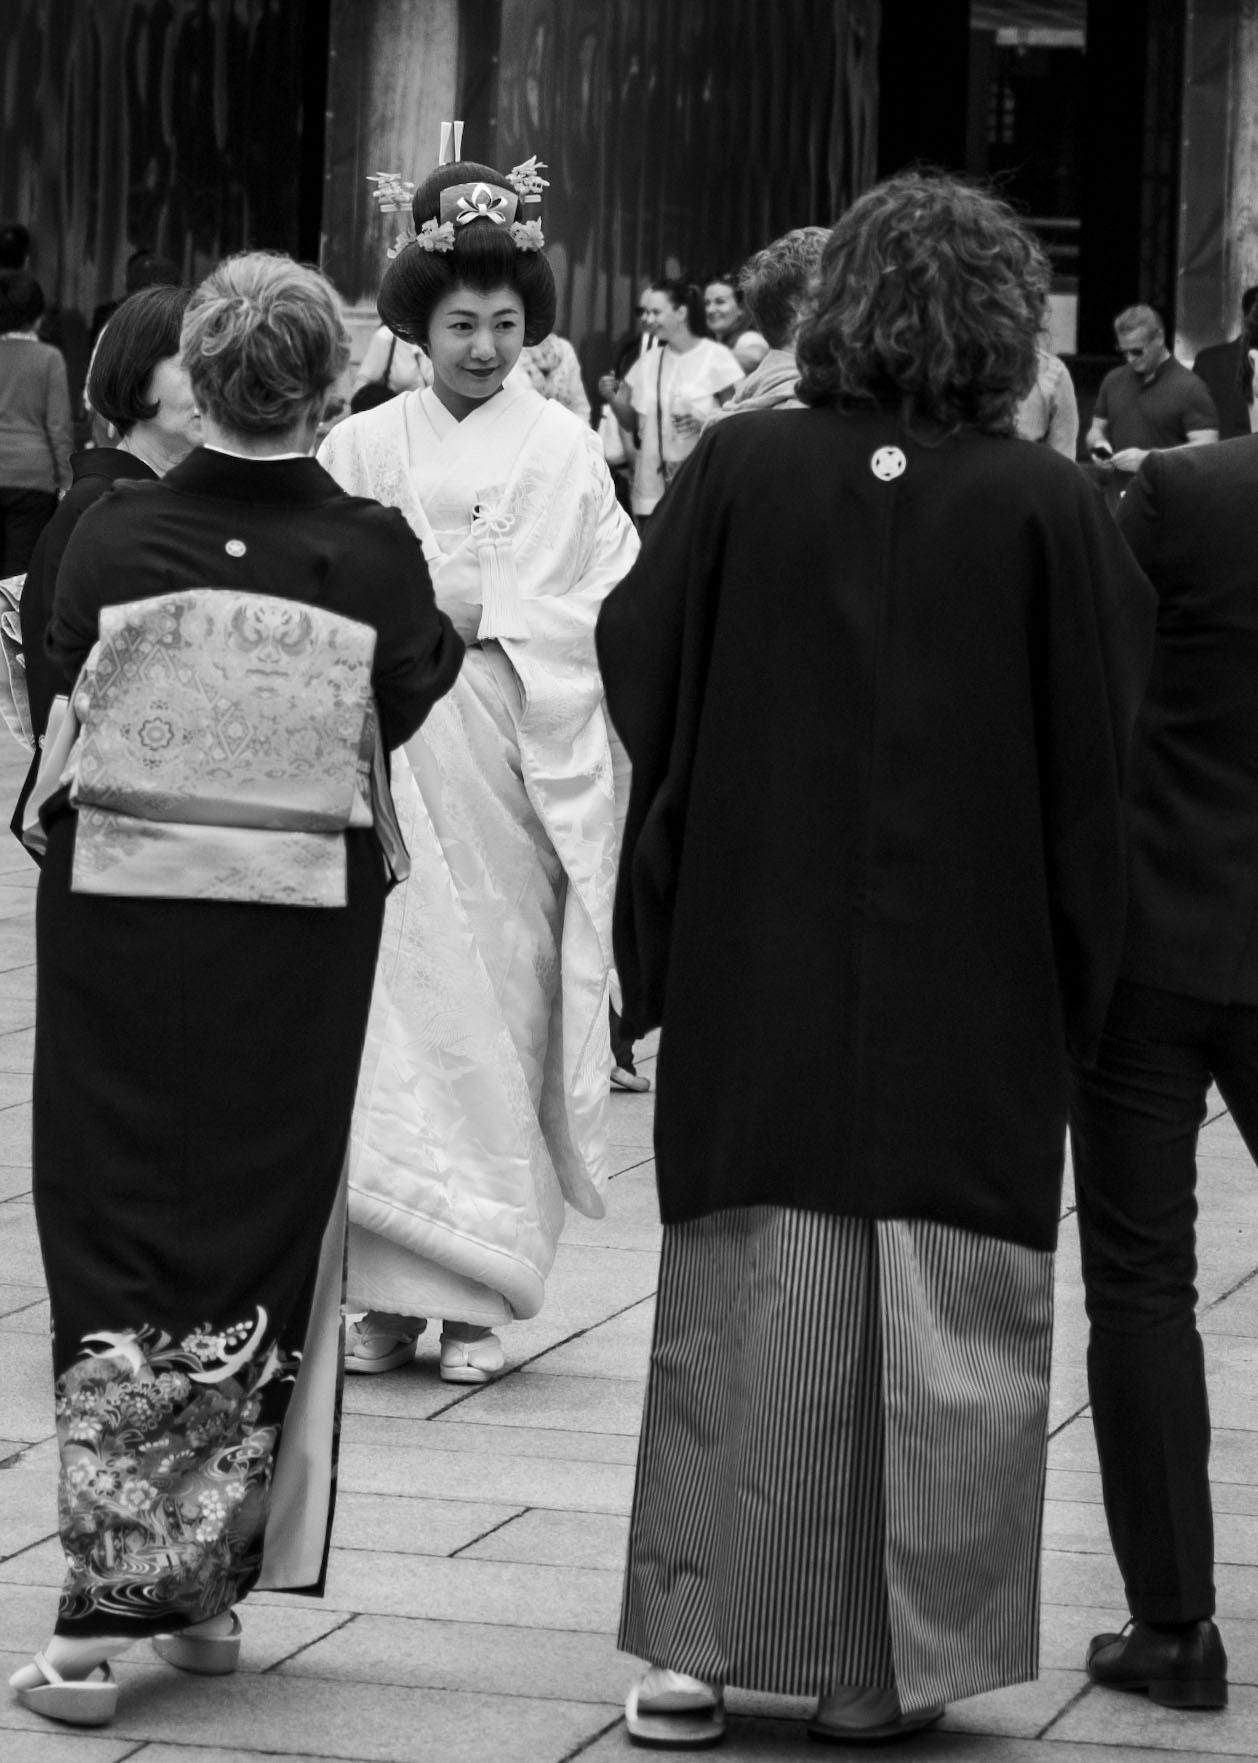 Auguri Matrimonio Giapponese : Matrimonio giapponese sprea fotografia